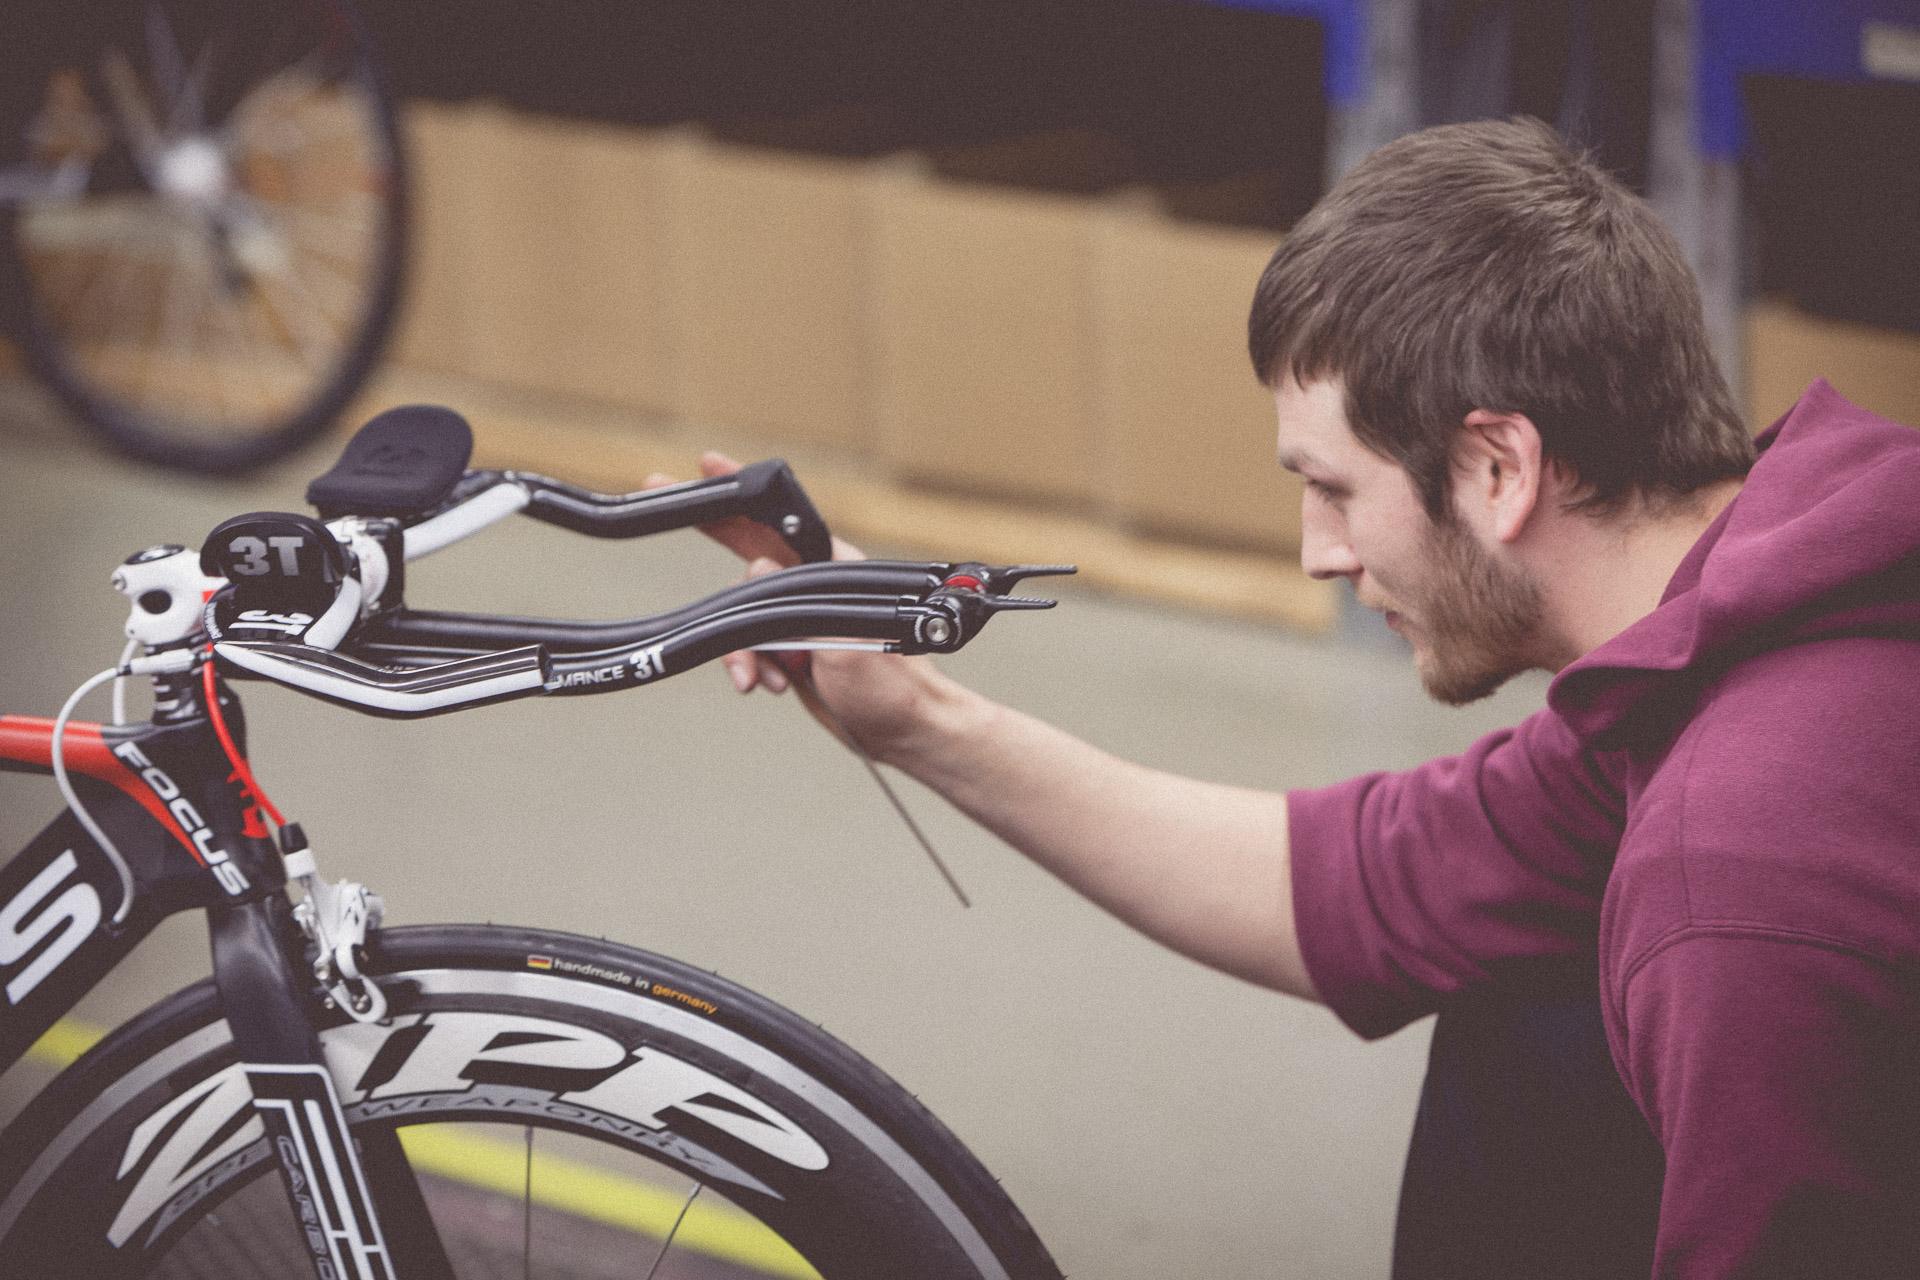 53-Derby-Cycle-Werke-Fahrradproduktion